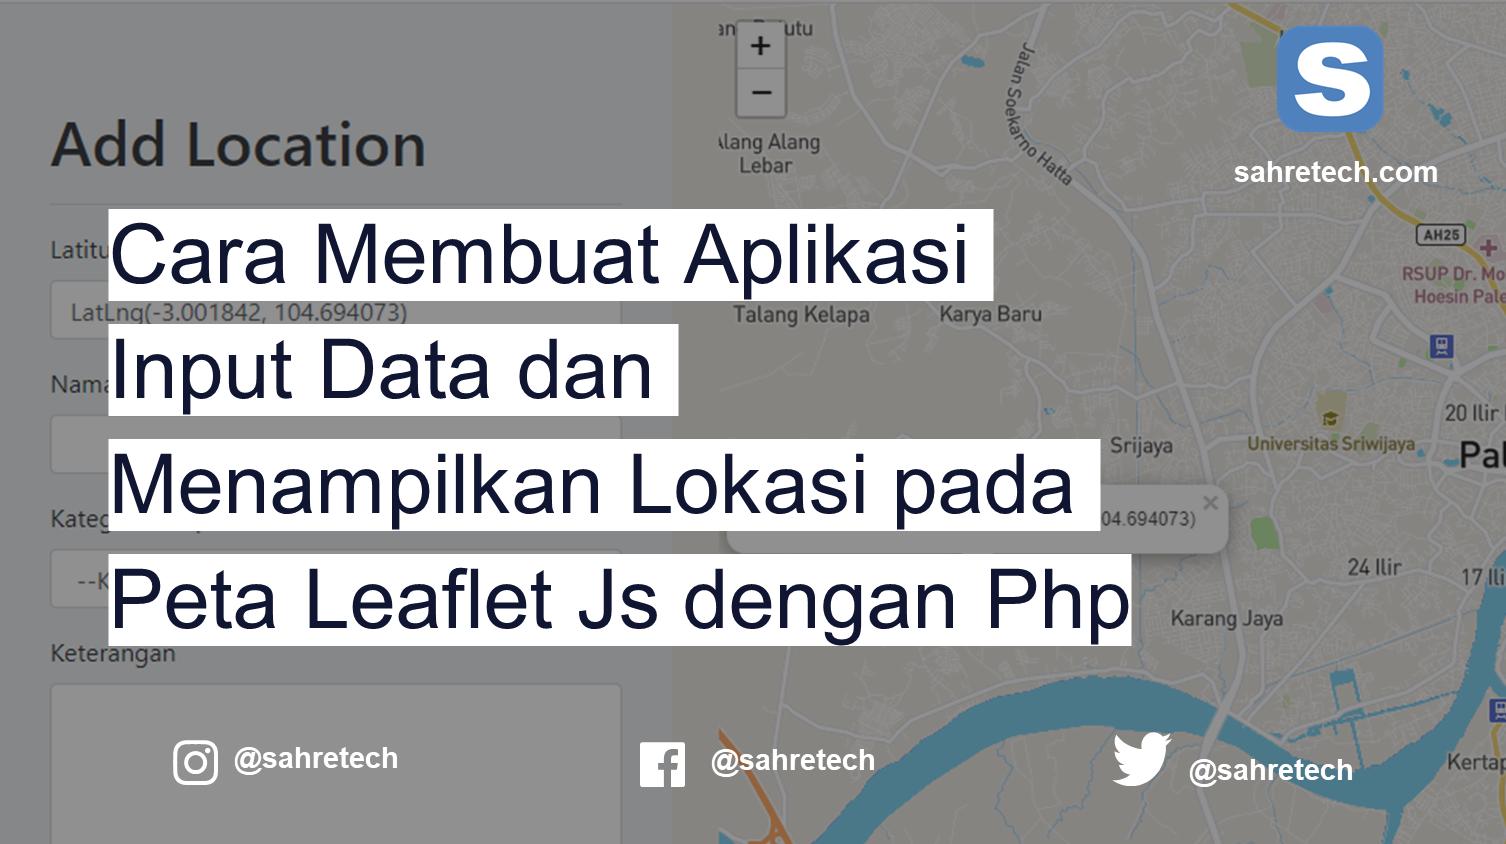 Cara Membuat Aplikasi Input Data dan Menampilkan Lokasi pada Peta Leaflet Js dengan Php